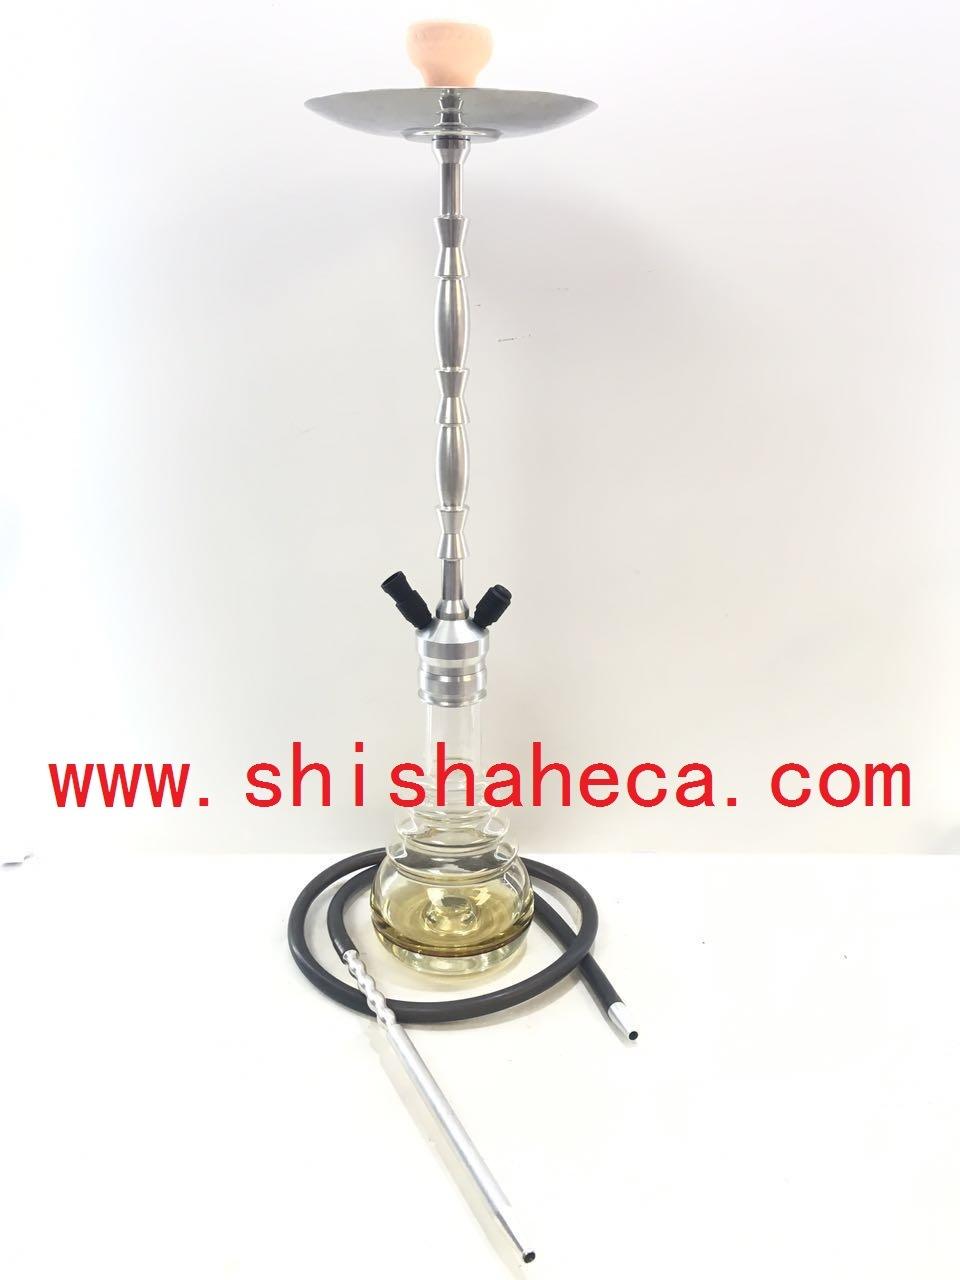 Wholesale Good Quality Aluminum Nargile Smoking Pipe Shisha Hookah